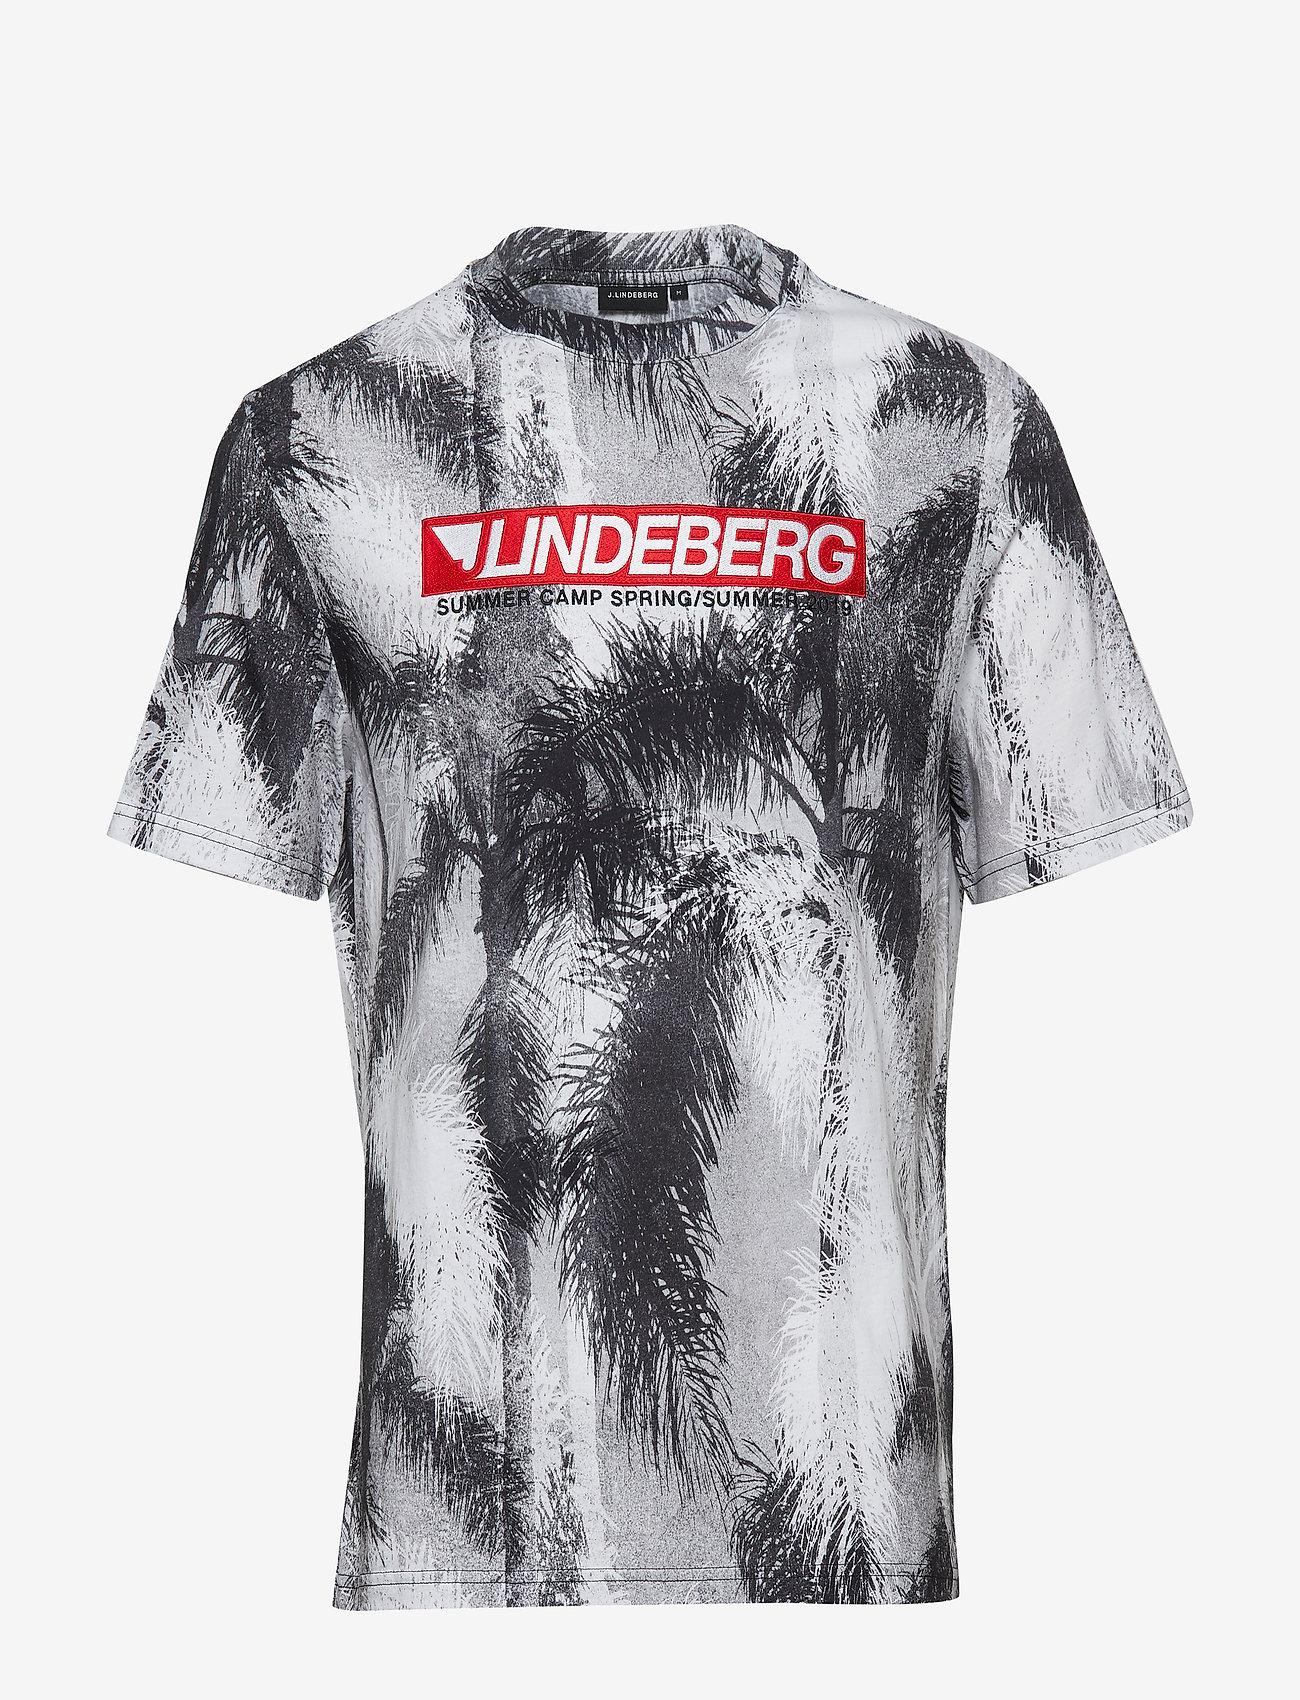 J.Lindeberg Dale Distinct T shirt | Fruugo NO